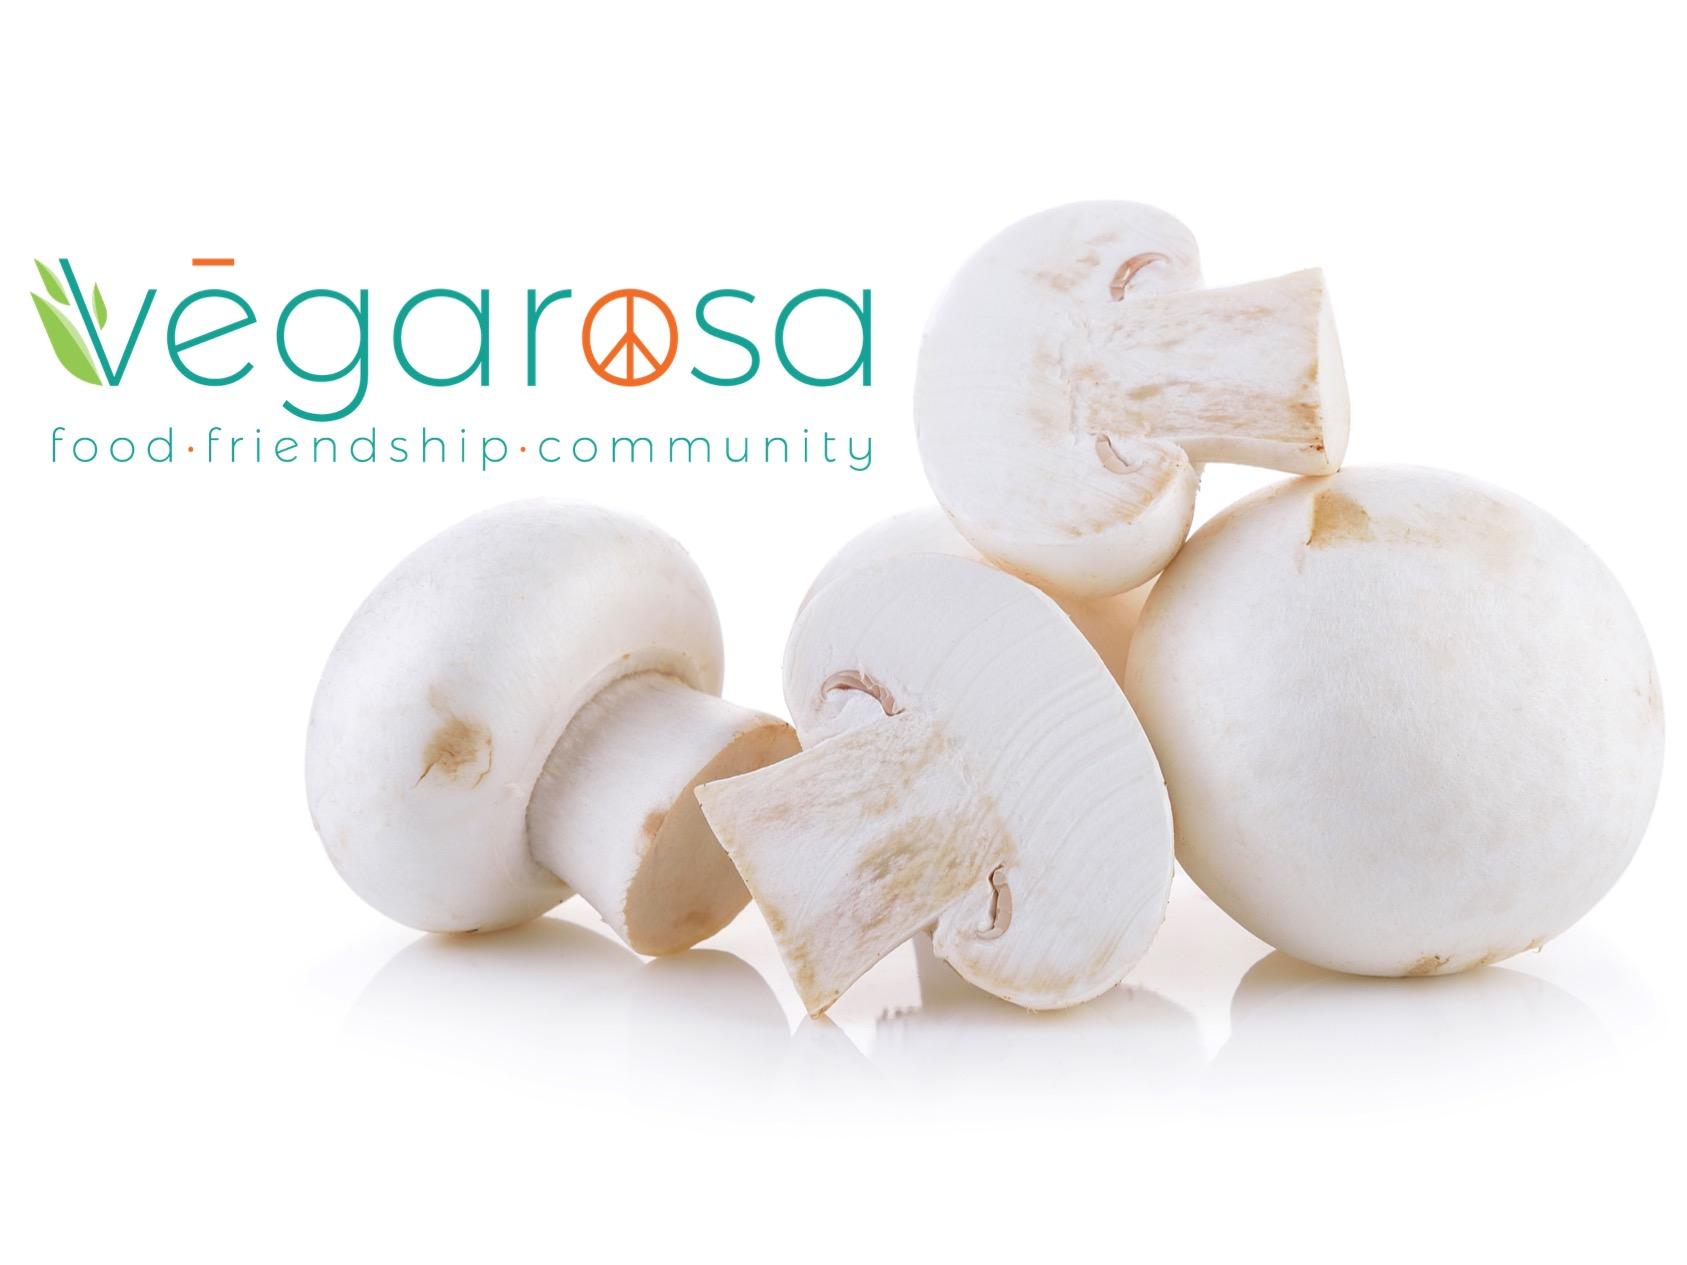 logo with mushrooms 2.0.jpg